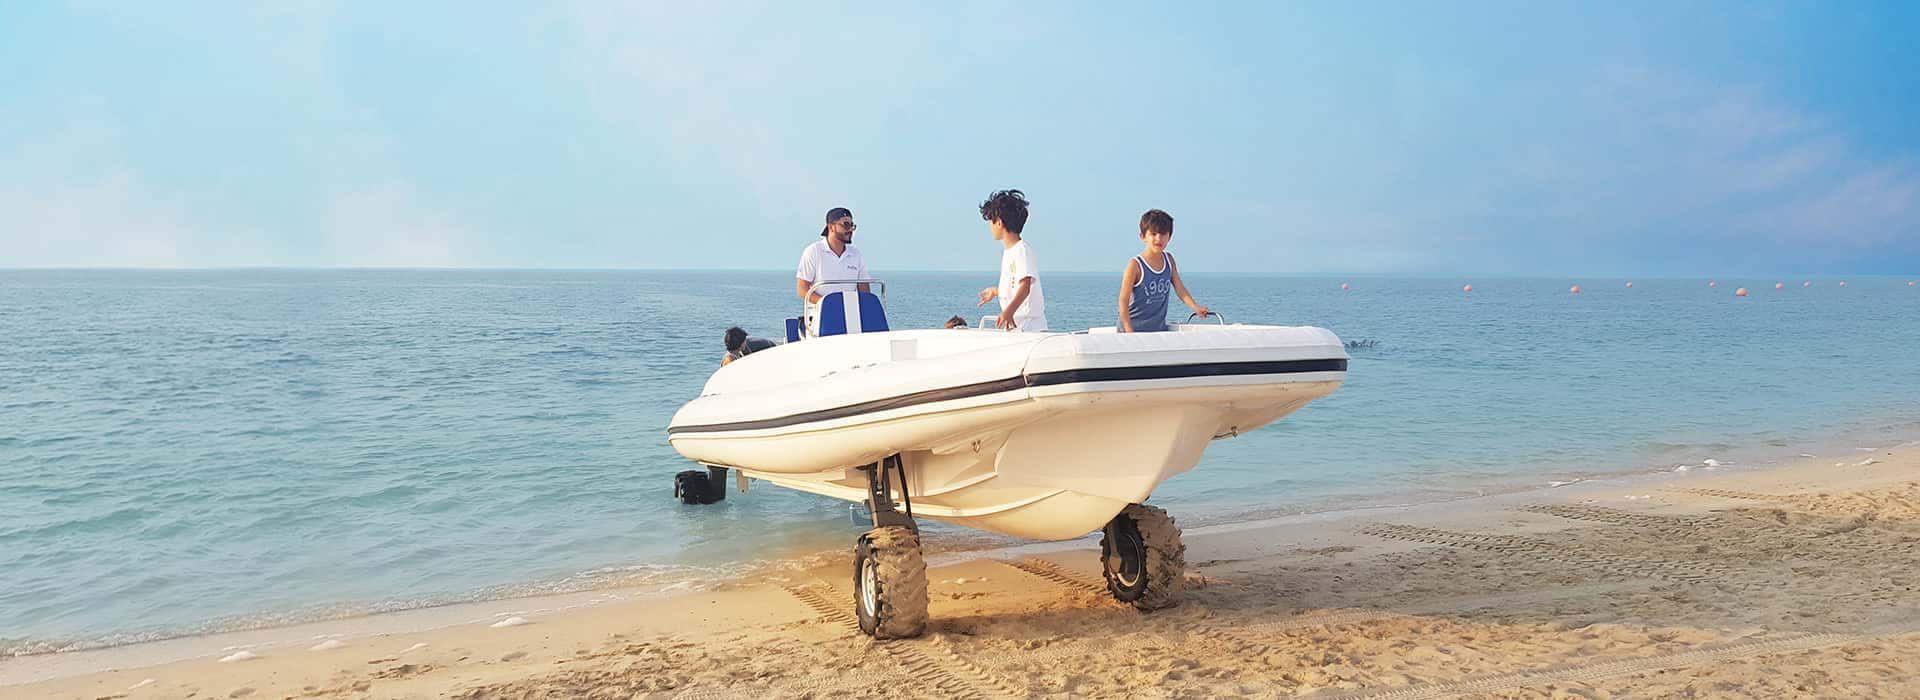 Professional Amphibious Beachlander Boats